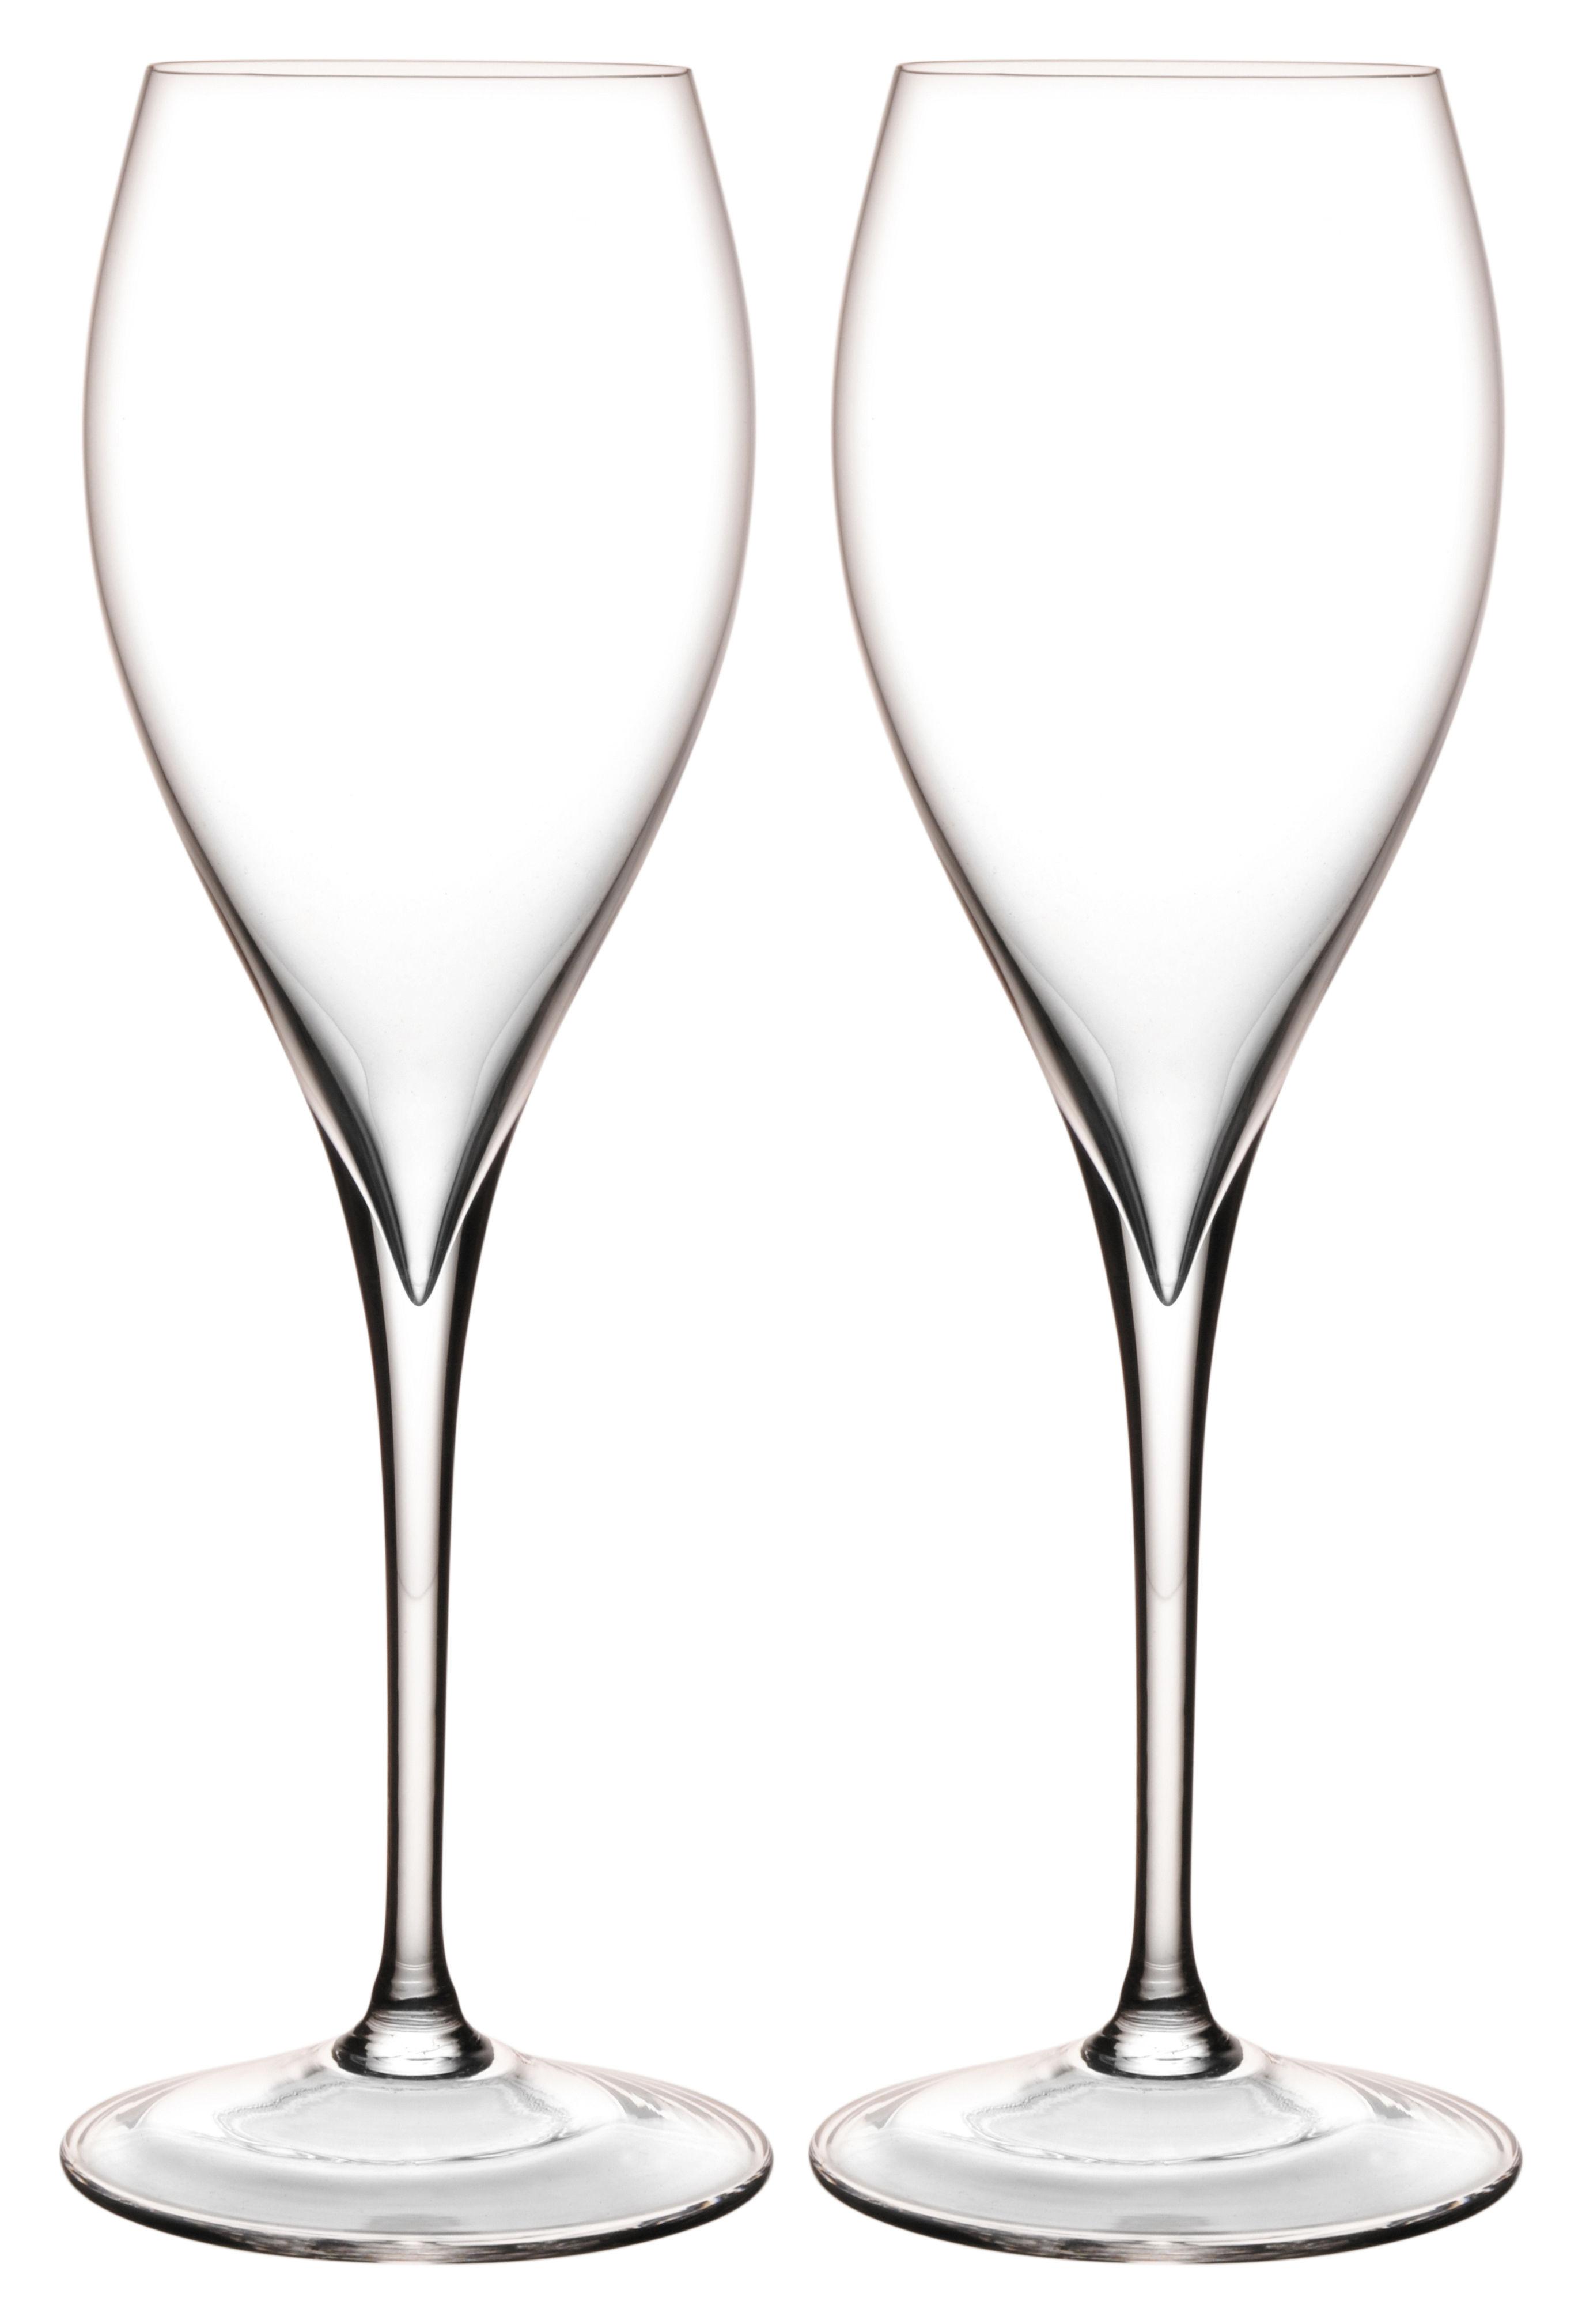 Tischkultur - Gläser - Grand Piqué Sektgläser / 2er-Set - L'Atelier du Vin - Transparent - geblasenes Glas